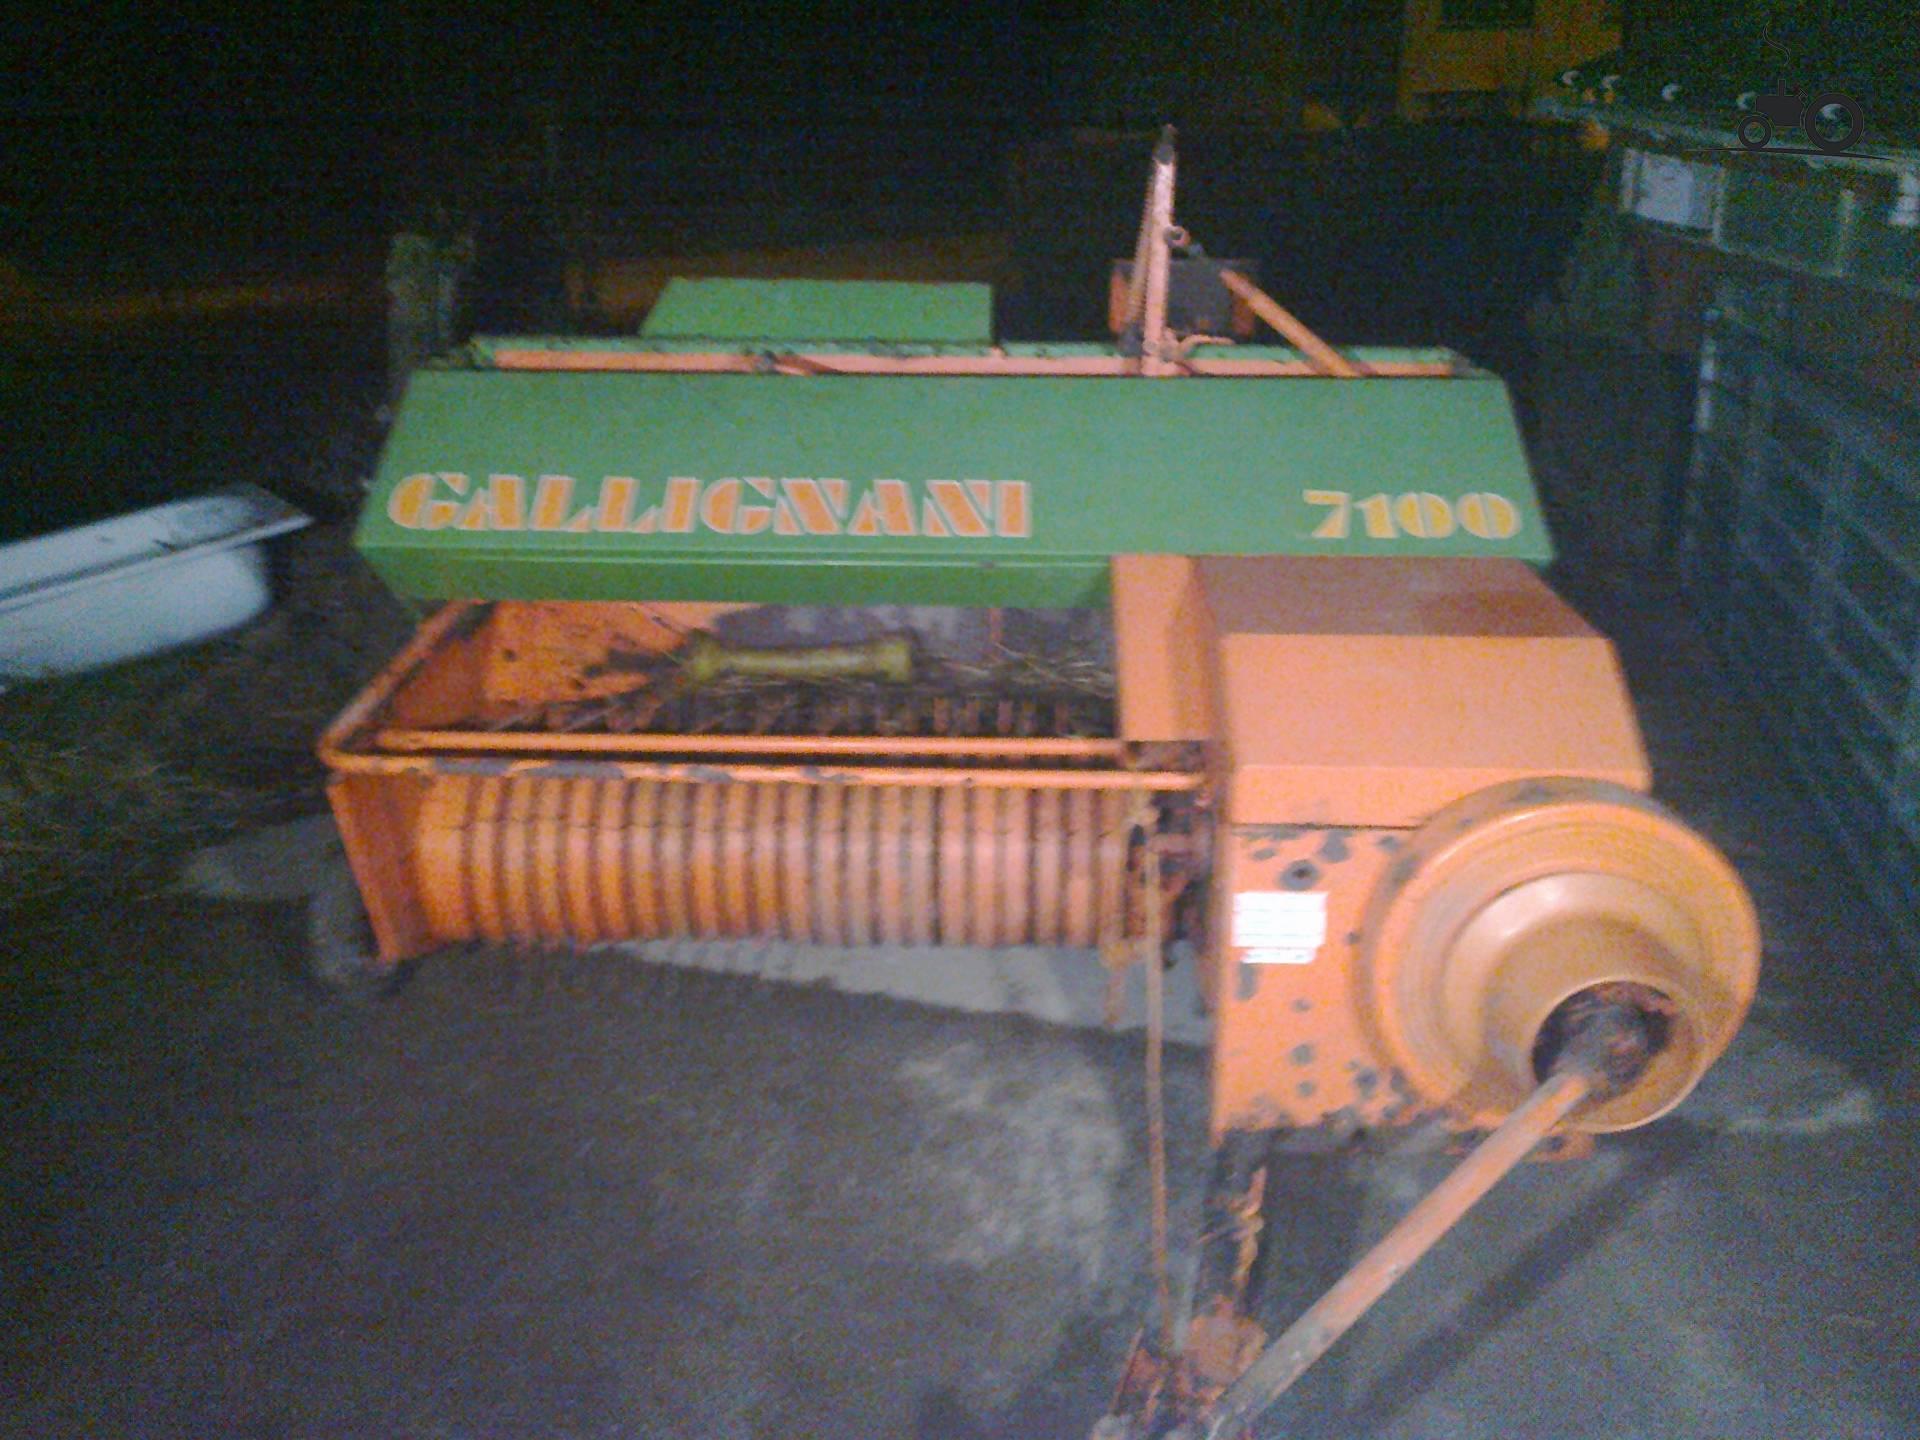 Gallignani 7100